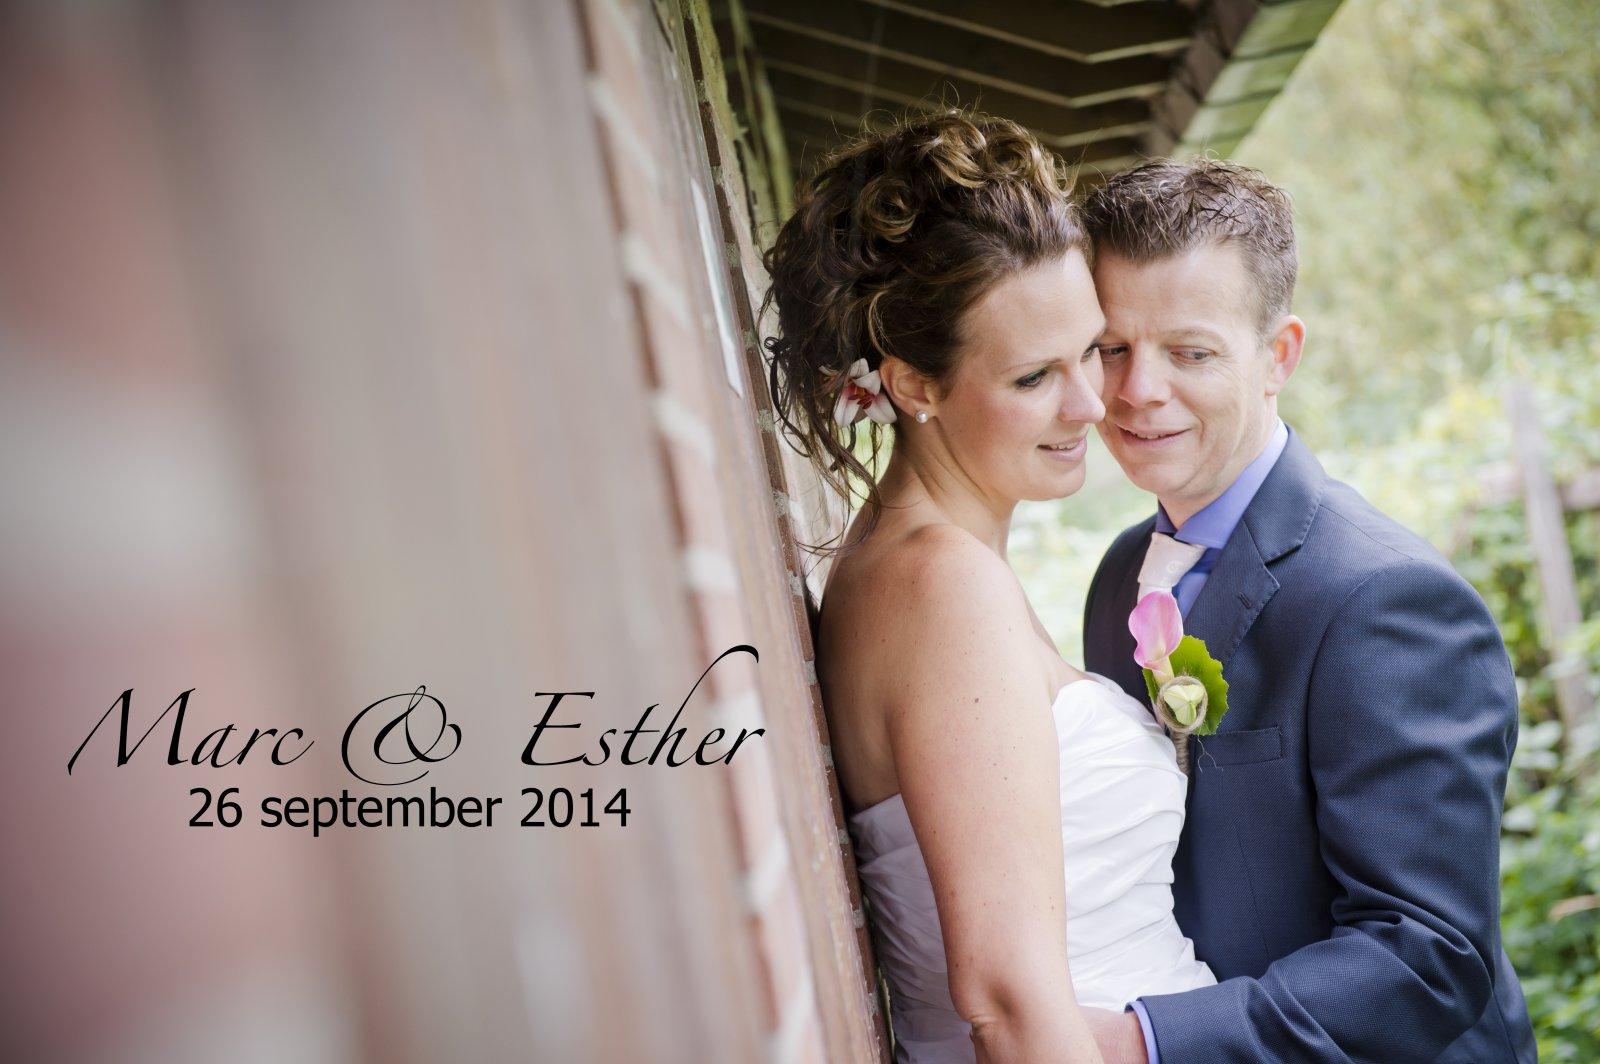 Bruidspaar Marc en Esther (26-09-2014)